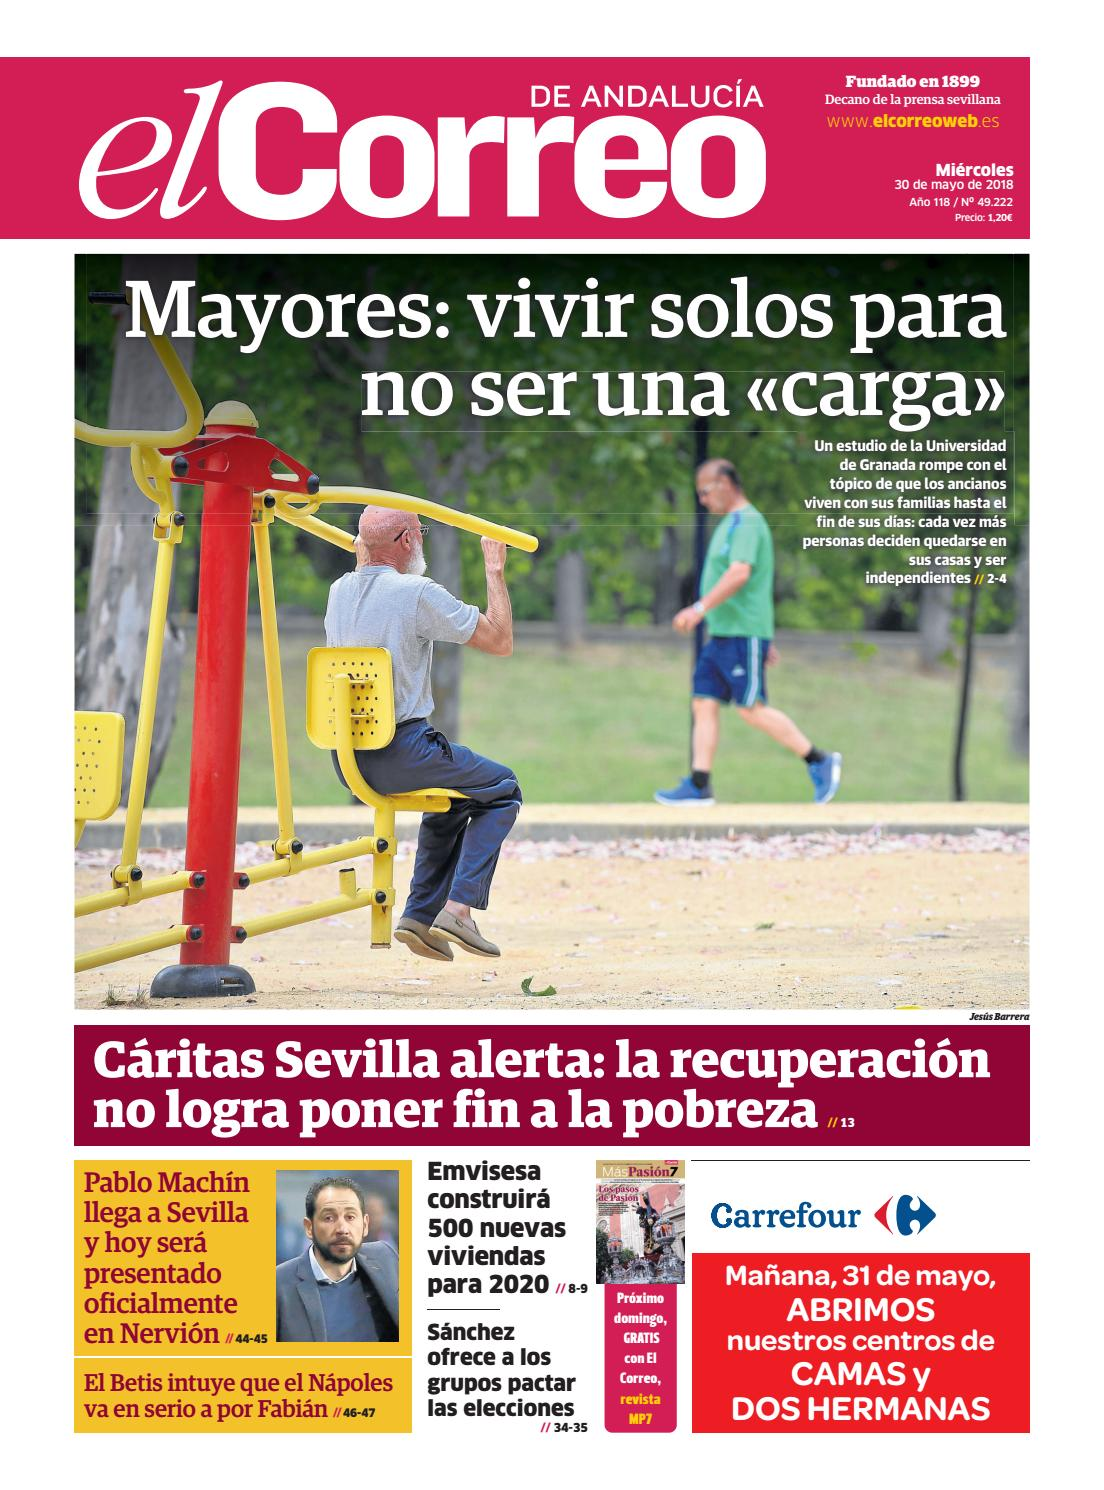 30.05.2018 El Correo de Andalucía by EL CORREO DE ANDALUCÍA S.L. - issuu b67ab5a60eaa